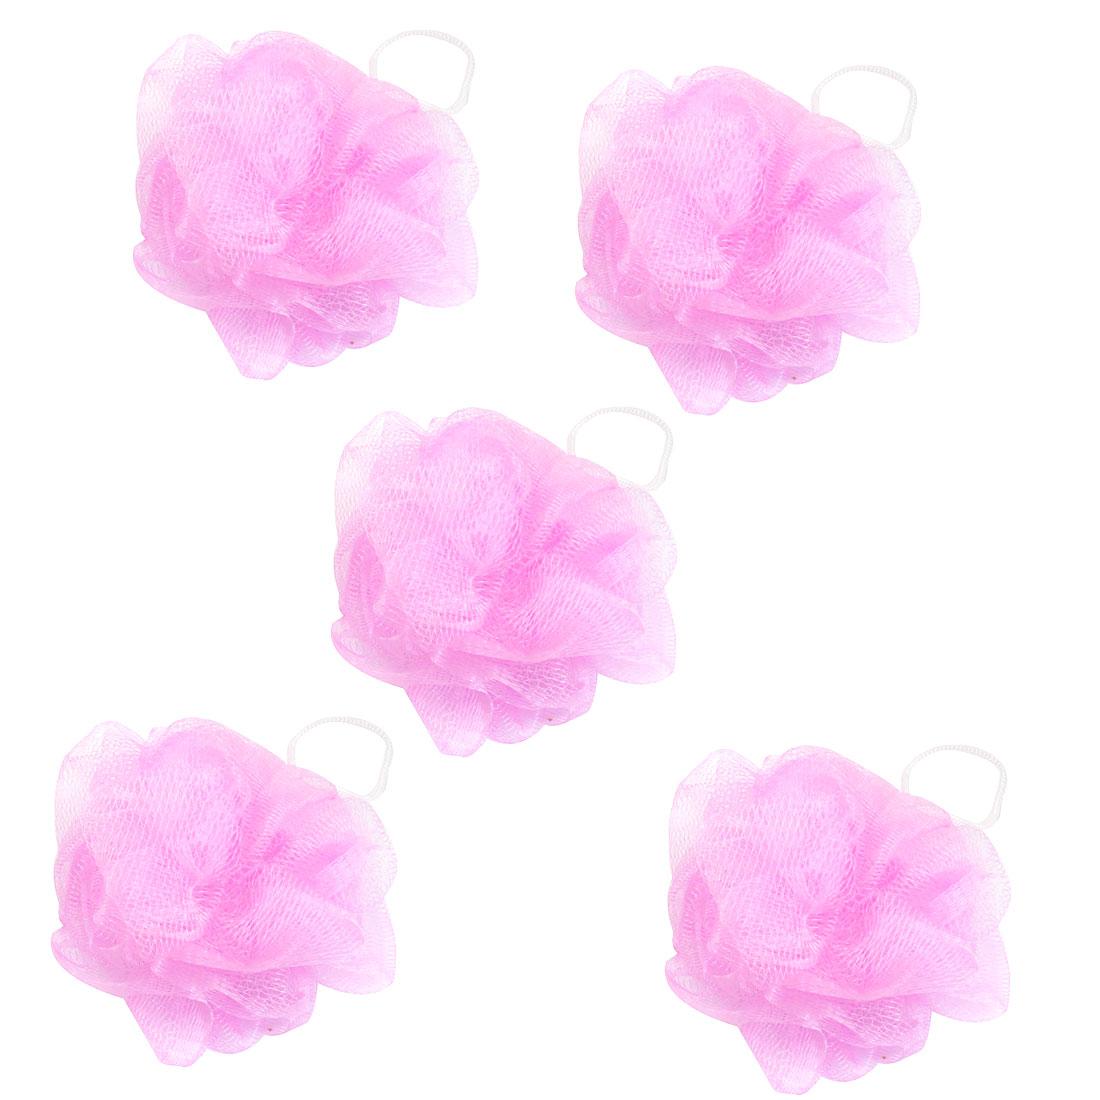 Bathroom Ball Shape Pink Nylon Mesh Net Pouf Shower 5 Pcs